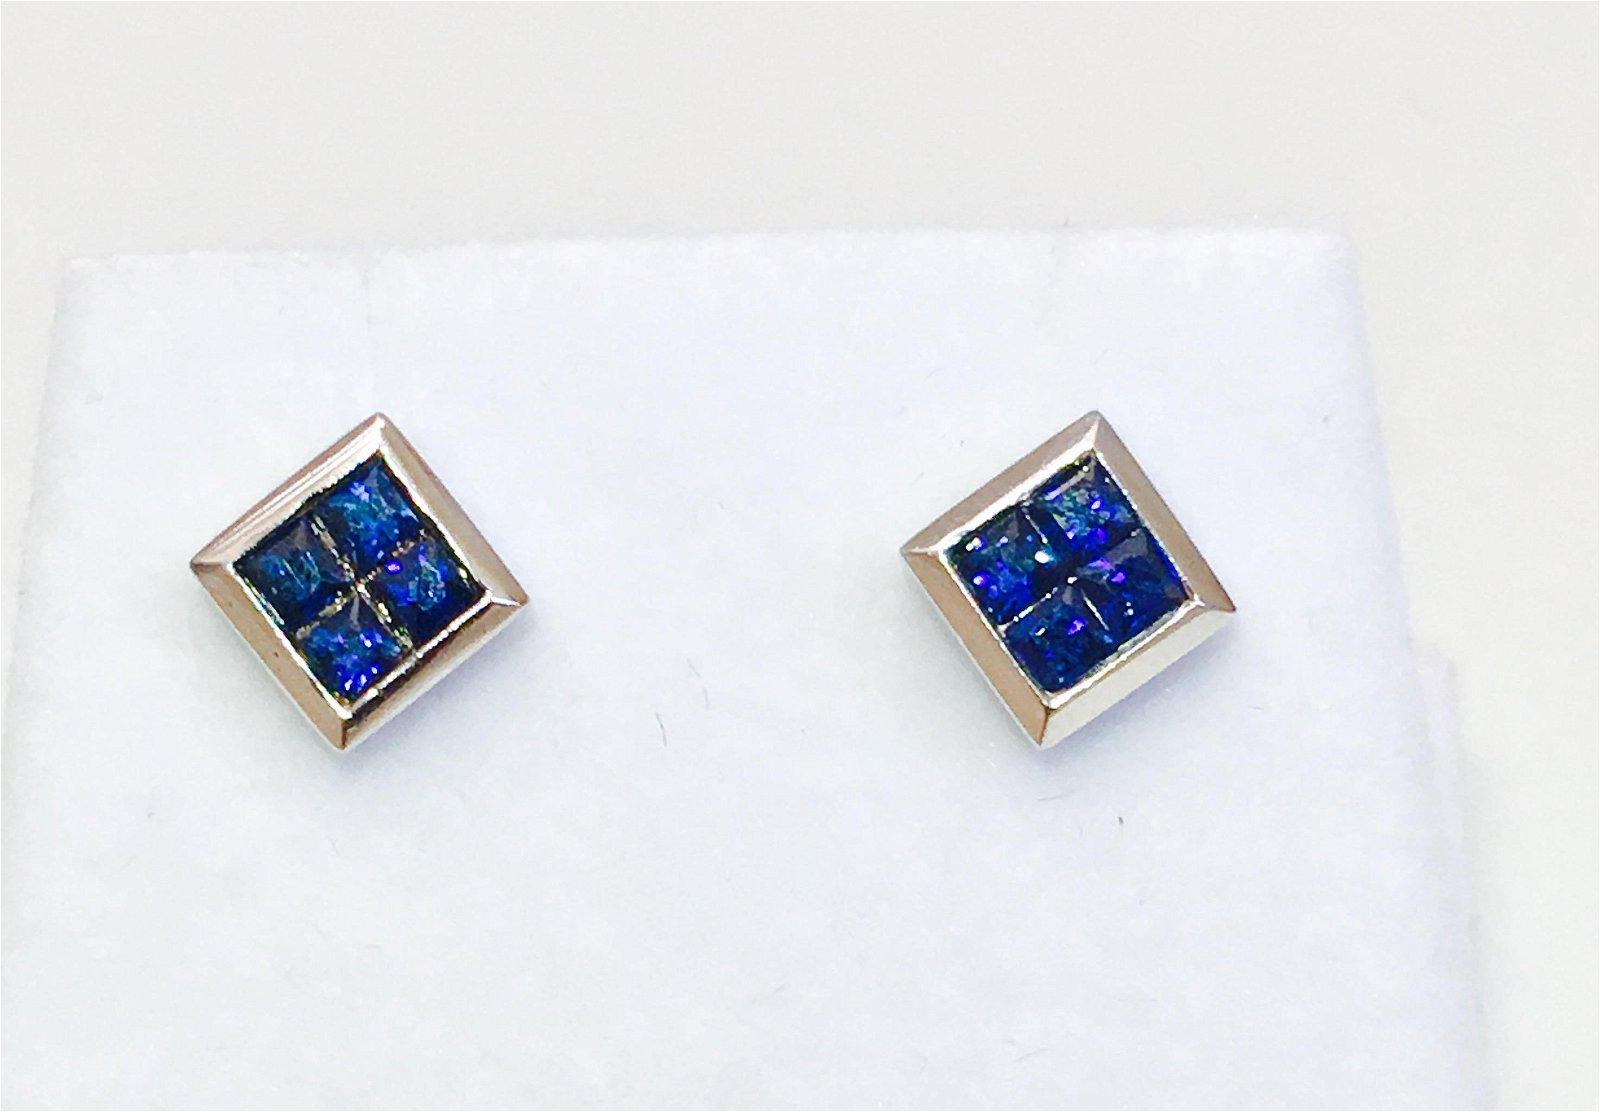 14K gold. 0.80 CT Blue Sapphire Studs Earrings